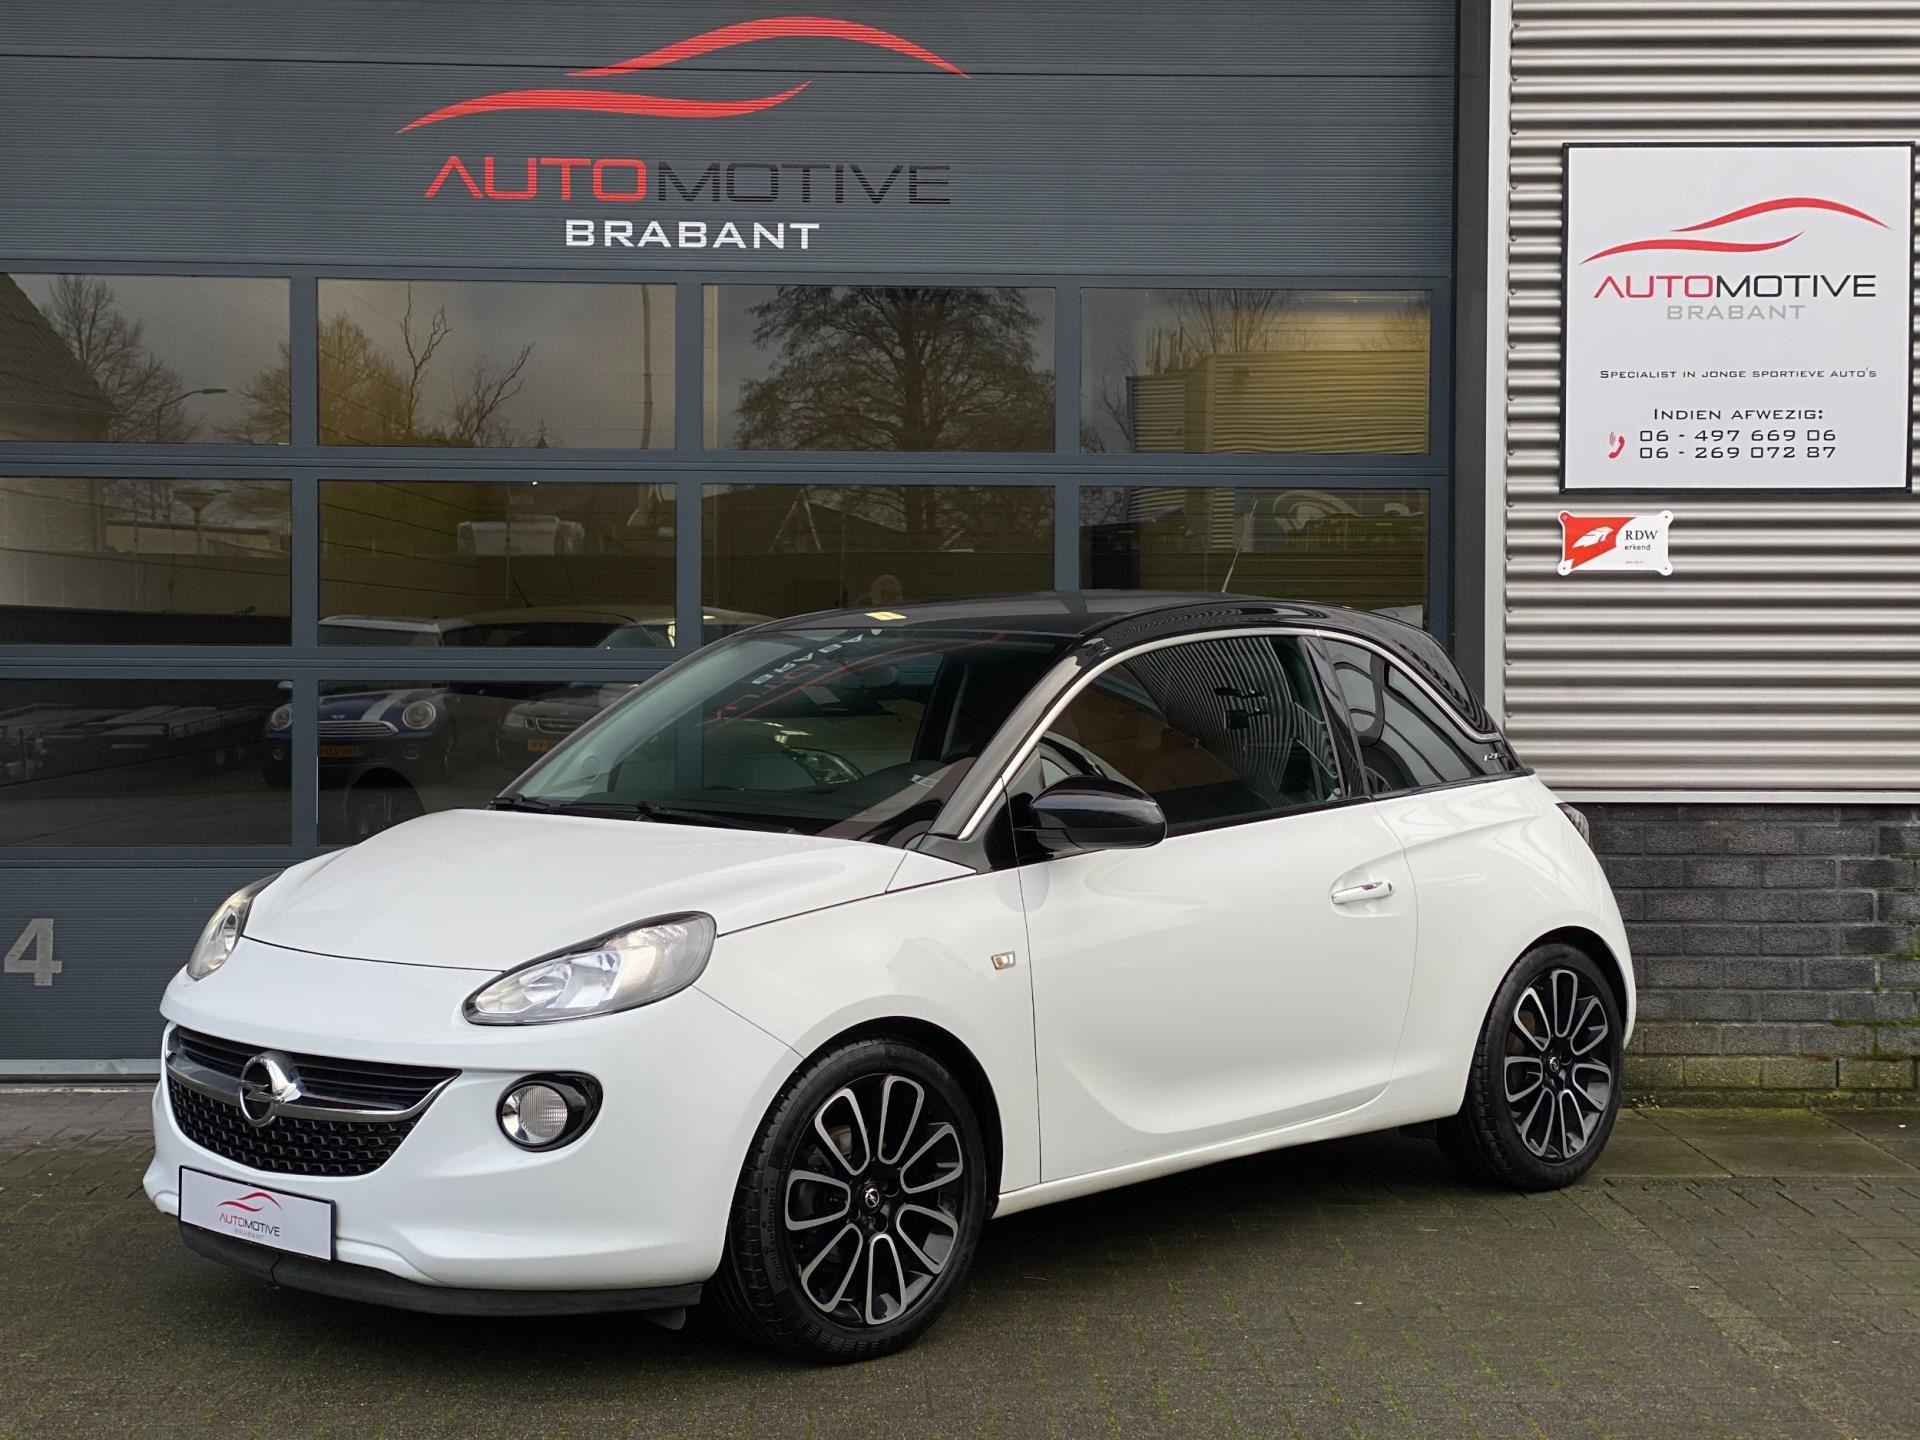 Opel ADAM occasion - Automotive Brabant